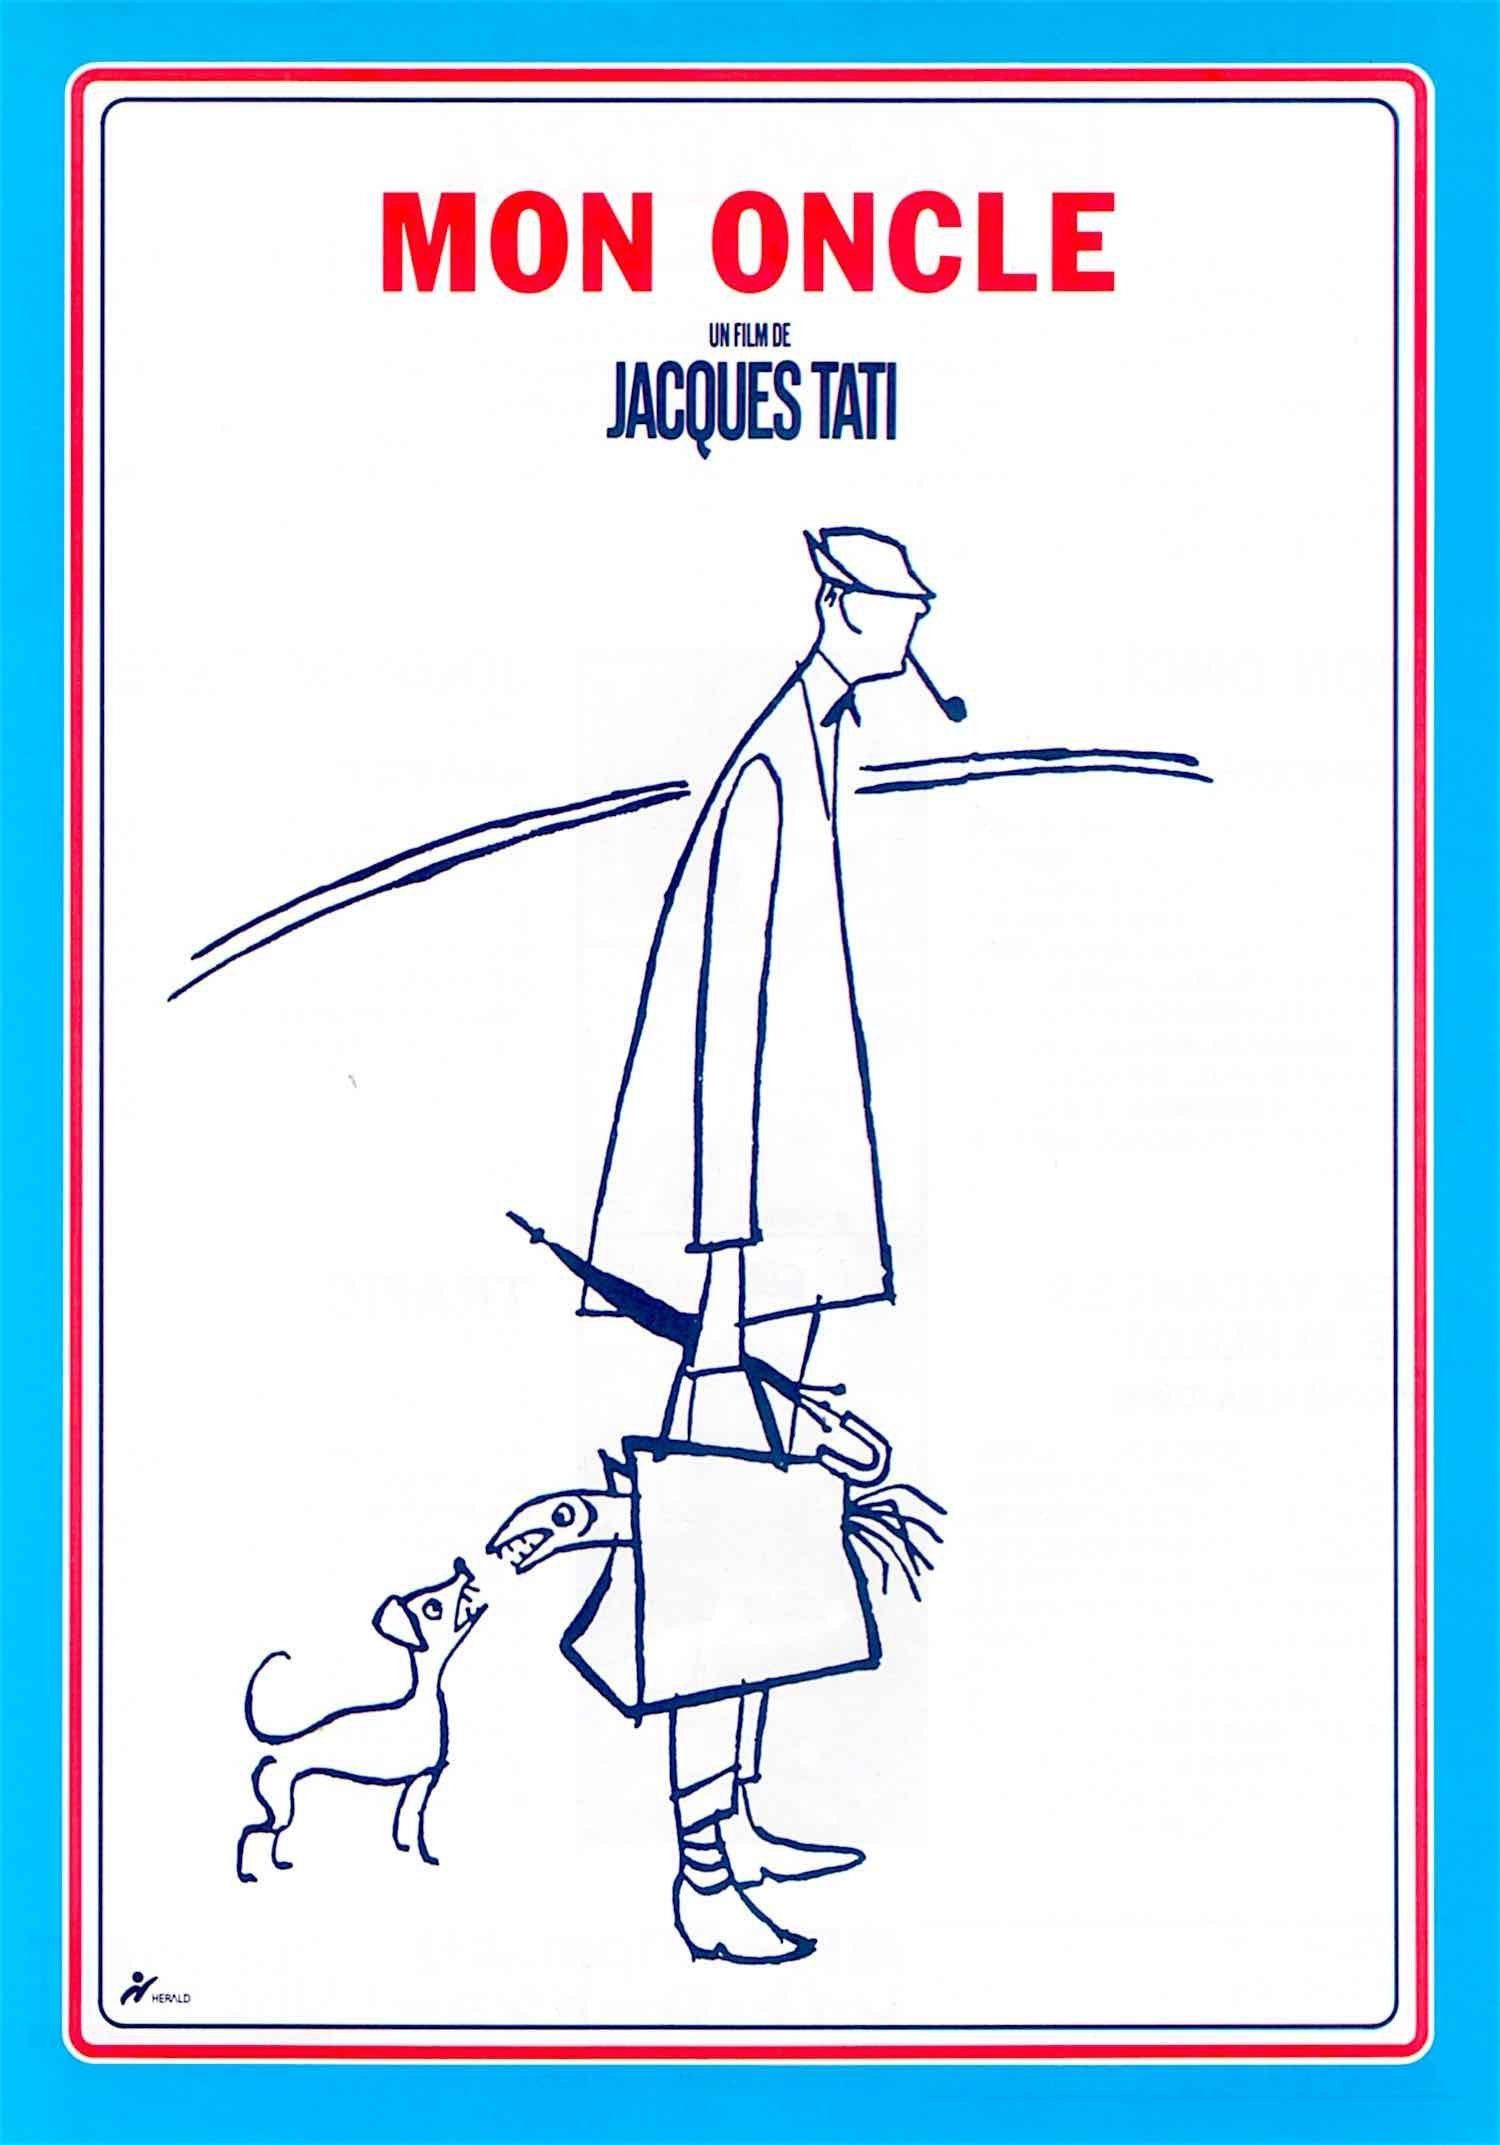 Mon oncle by Jacques Tati vintage movie poster print